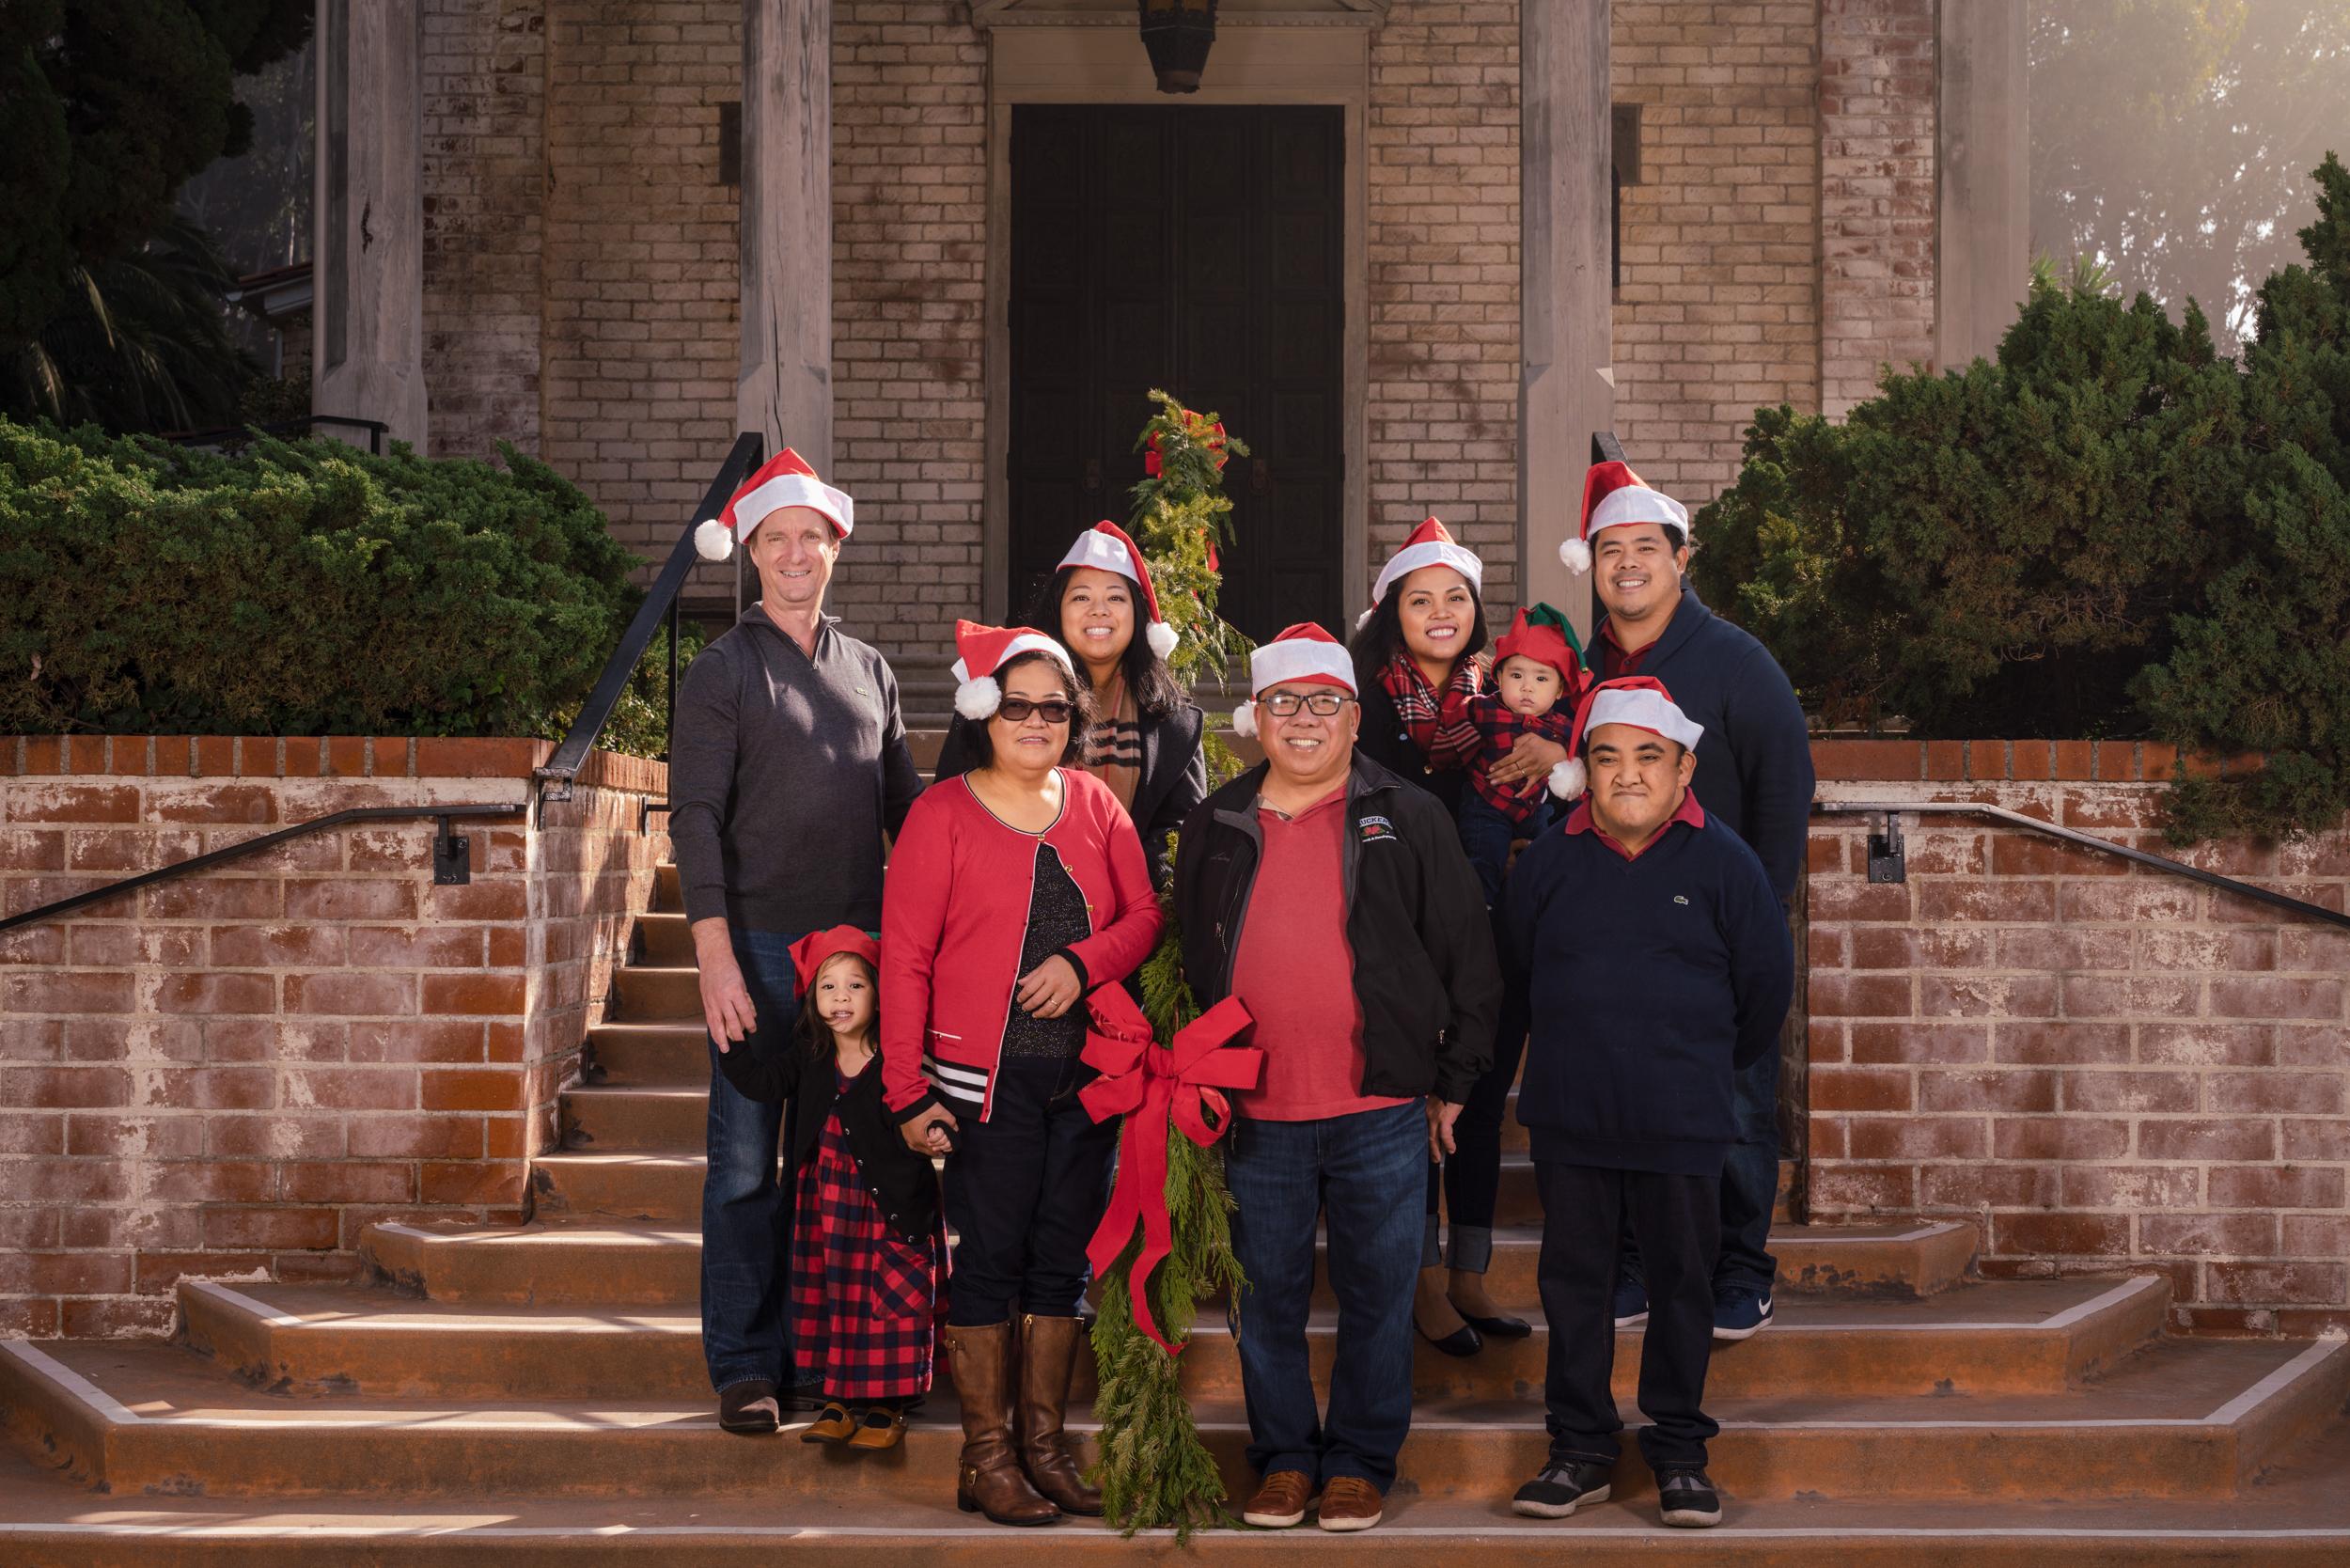 Rochelle King | Family Portraits - Dec 23, 2018